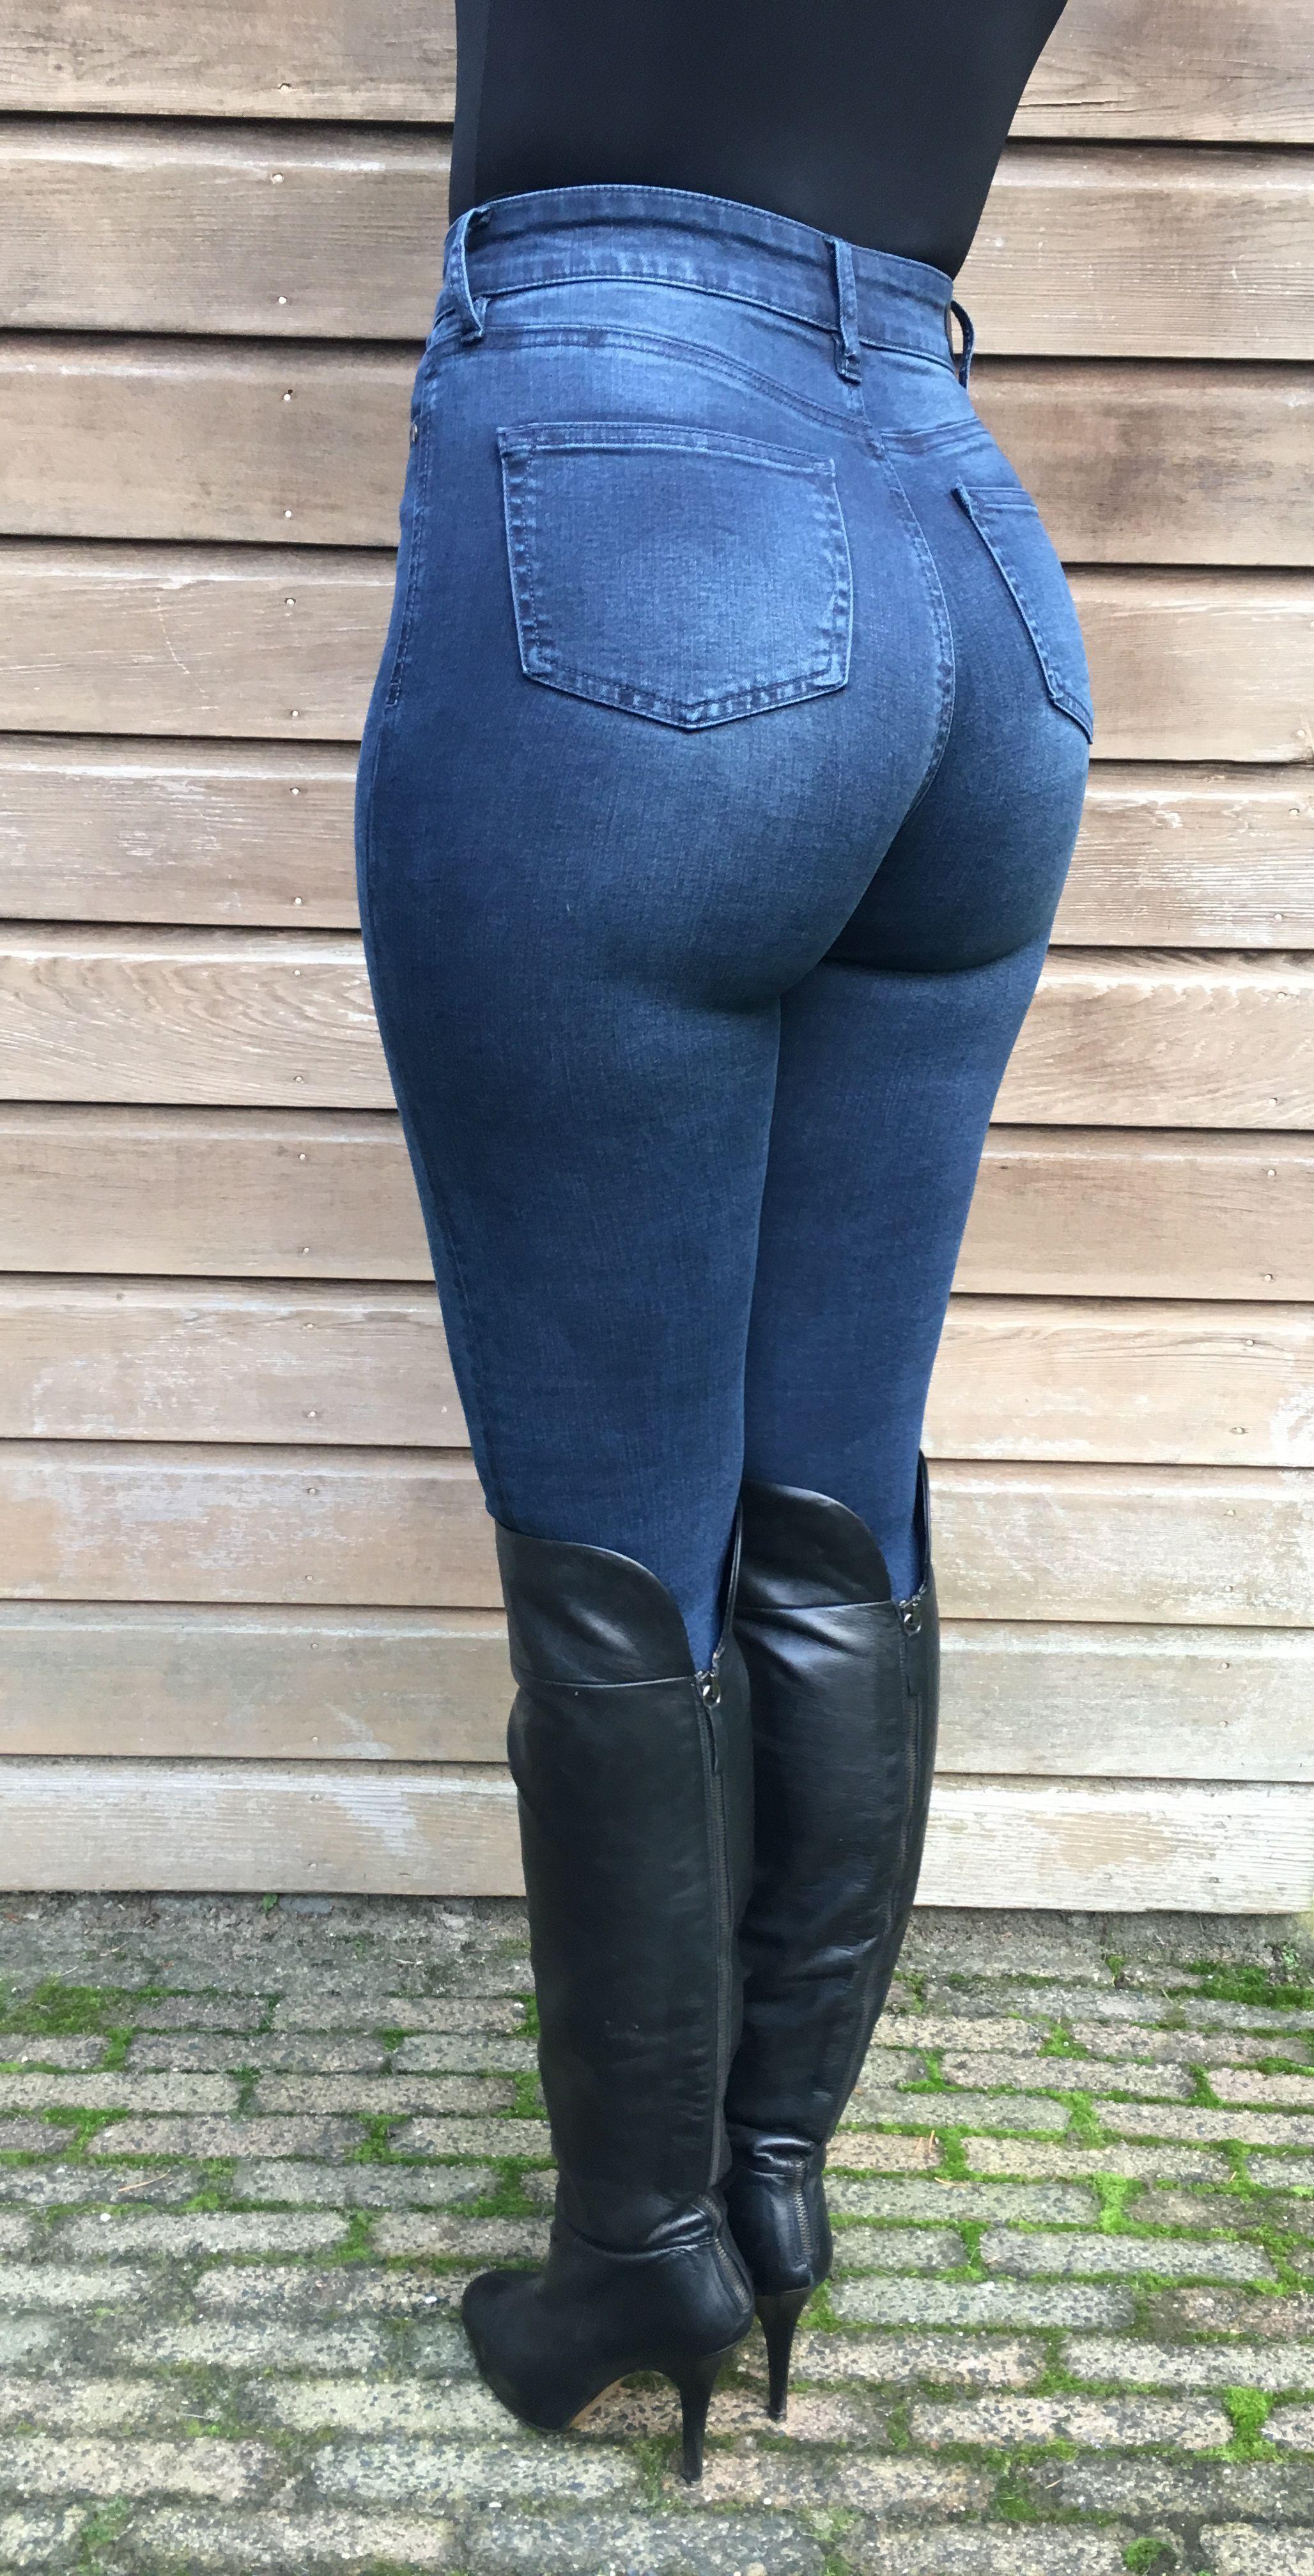 Stephanie Wolf - wearing my tight dark blue jeans   X Jean 2   Jeans ... 1c972ee16c